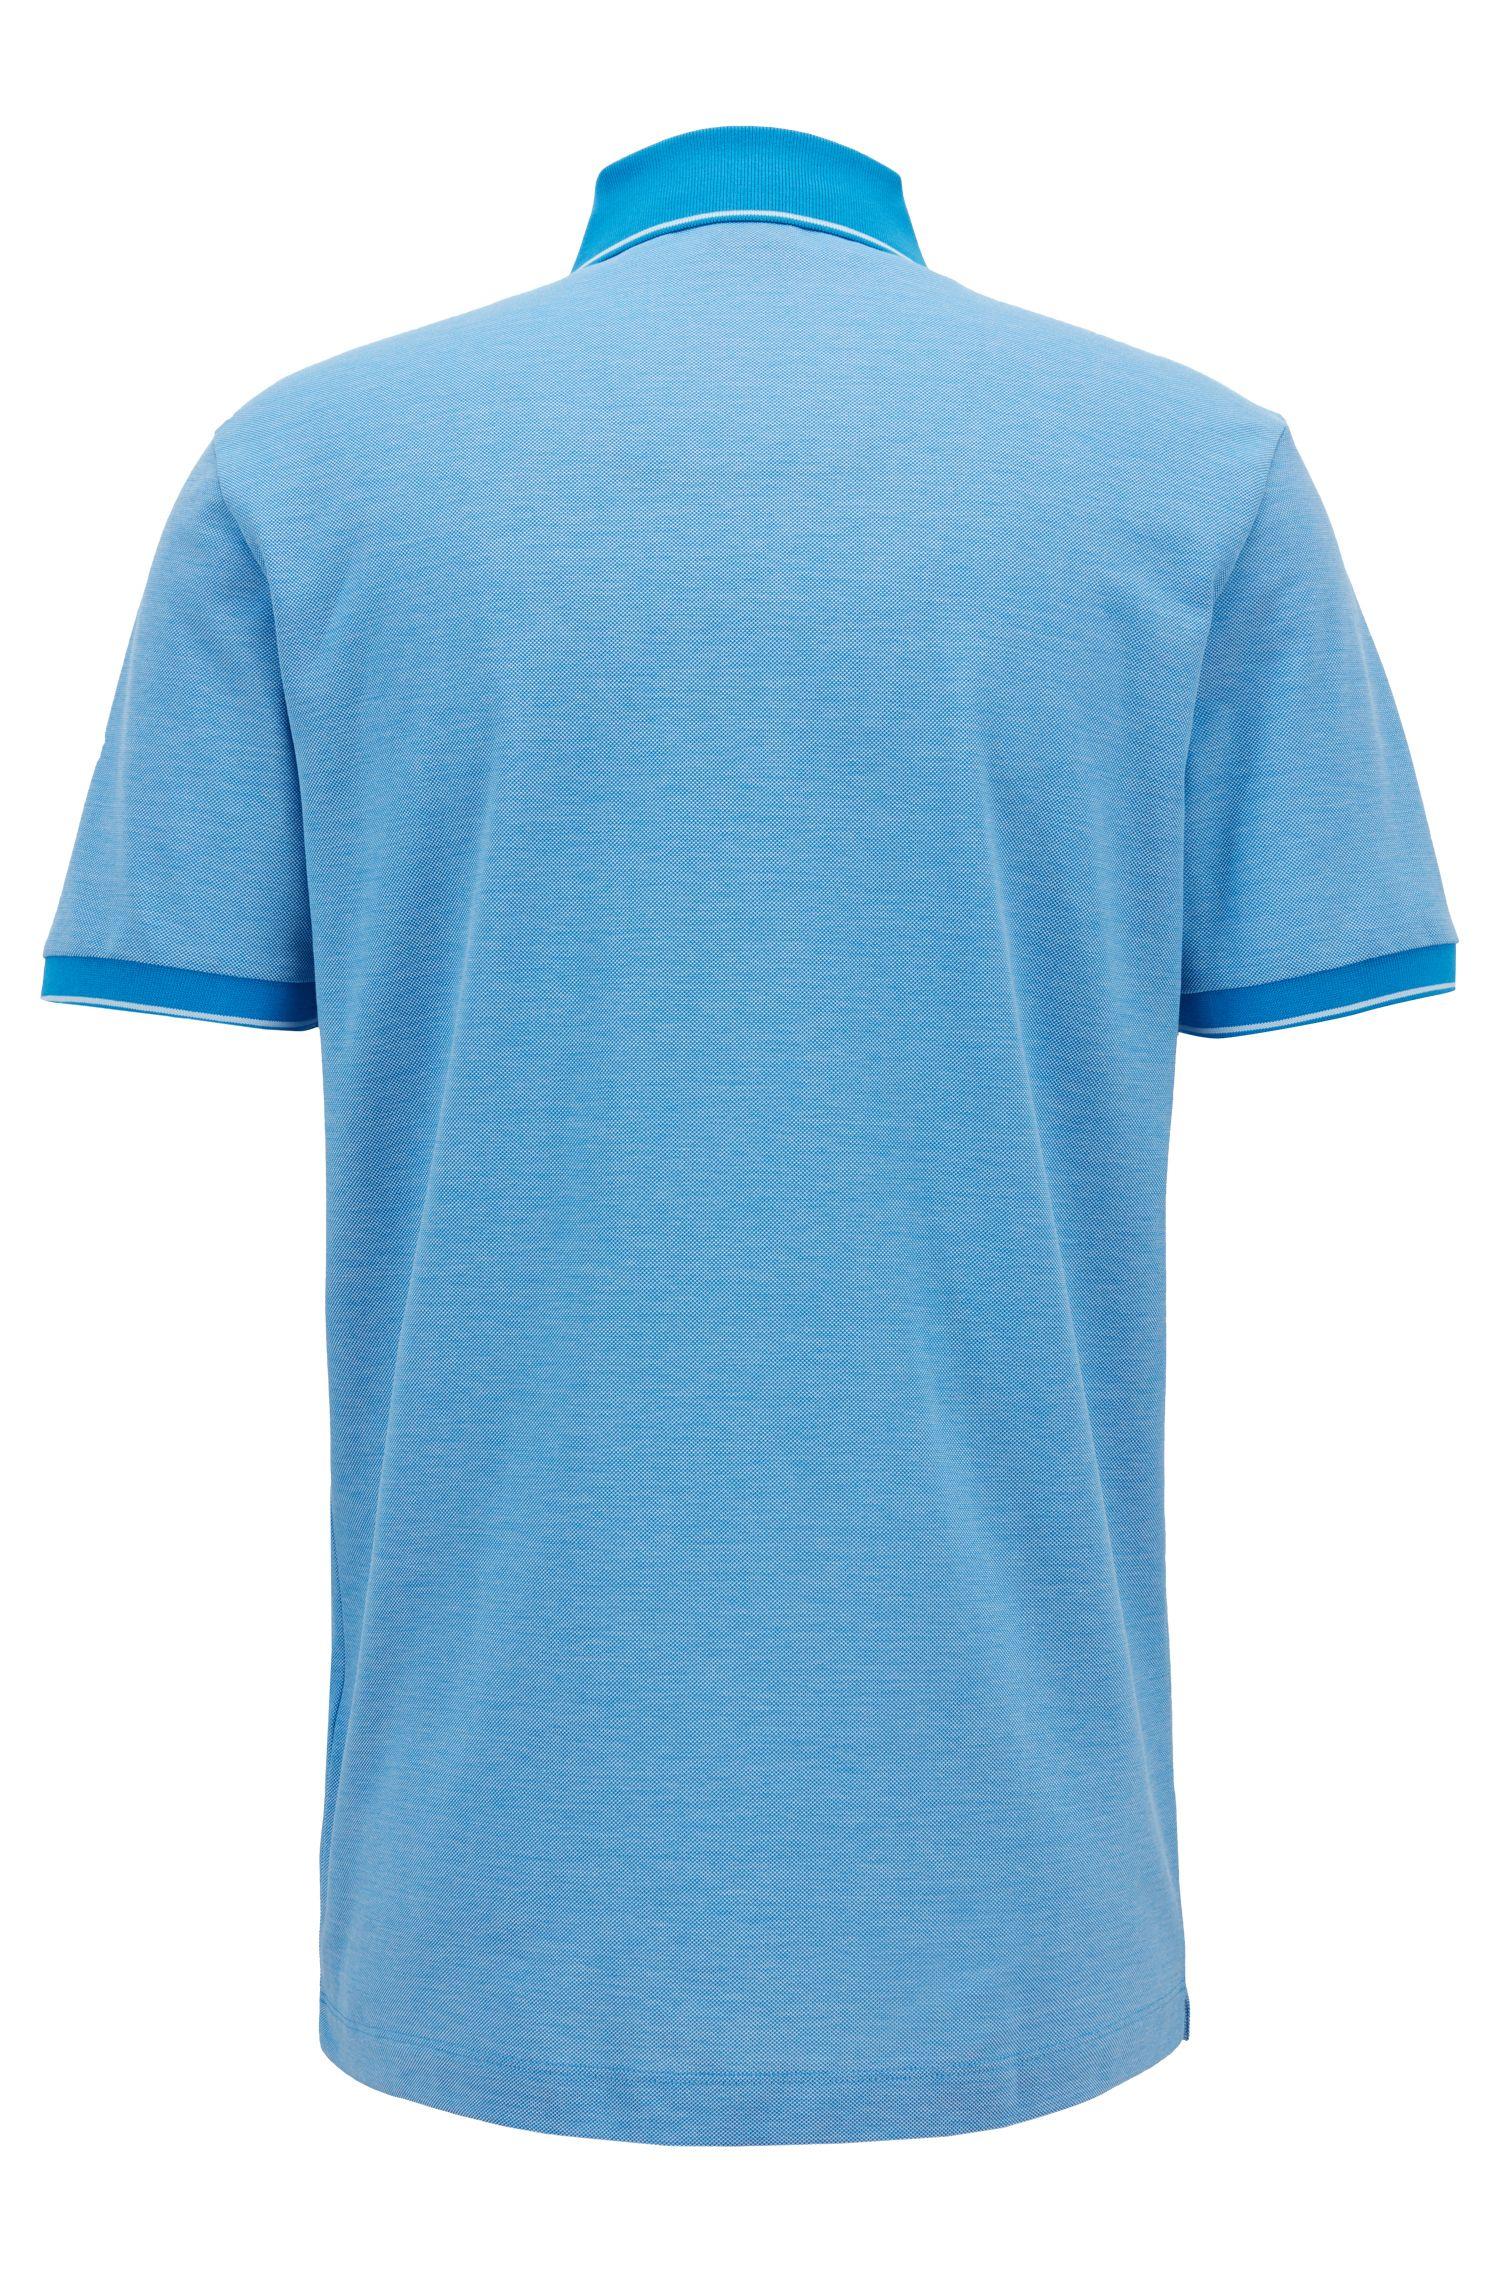 Regular-fit mercerised cotton piqué polo shirt